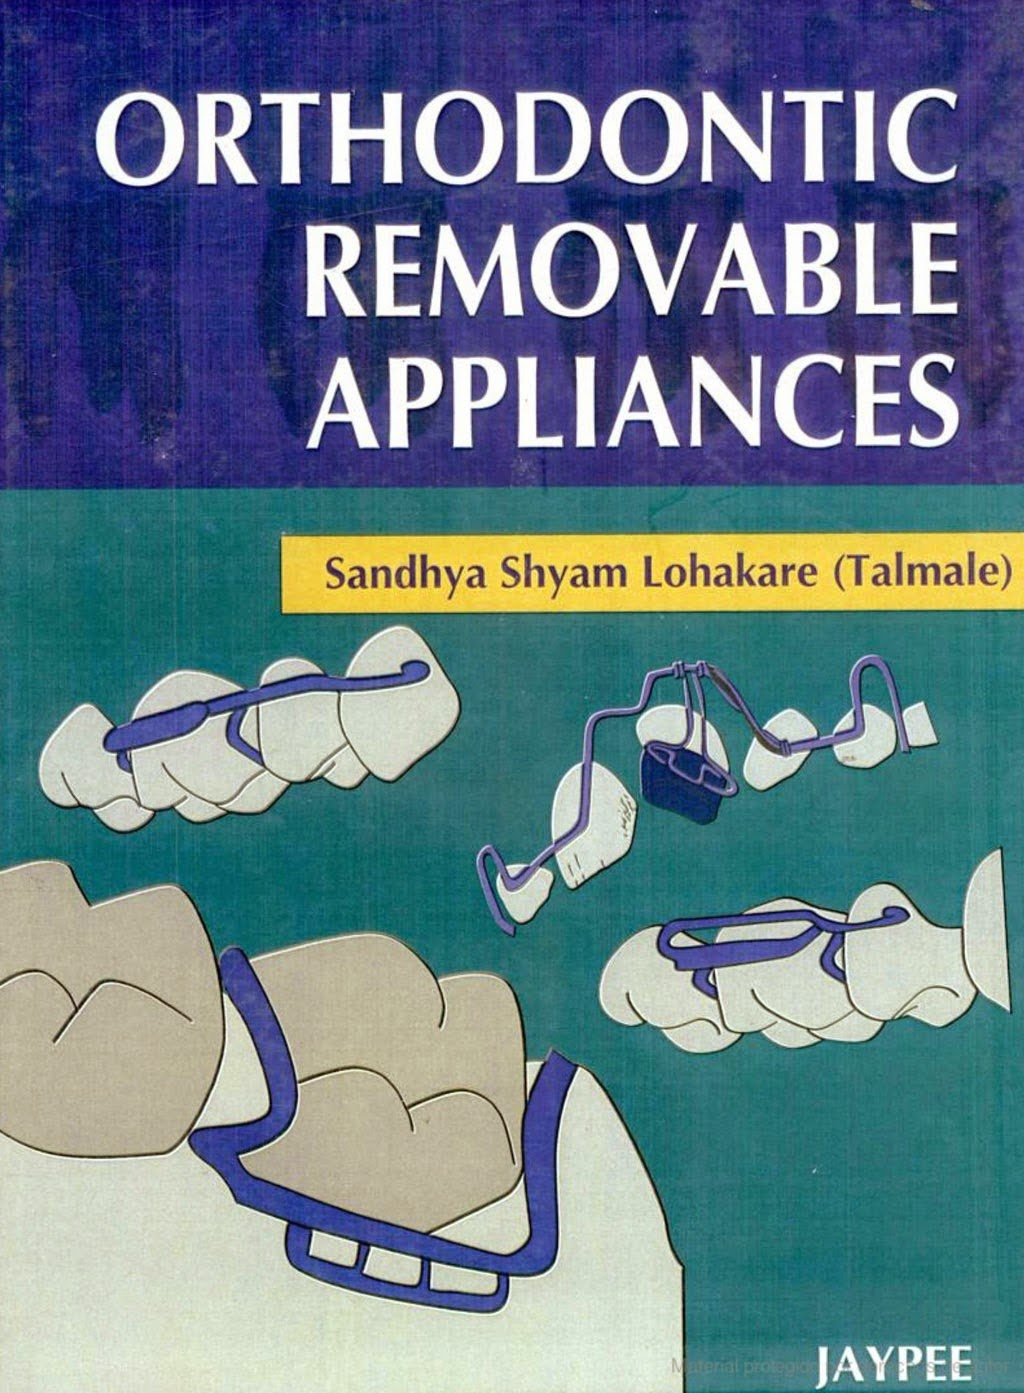 Orthodontic Removable Appliances - Sandhya Shyam Lohakare - 1st.ed.© 2008.pdf